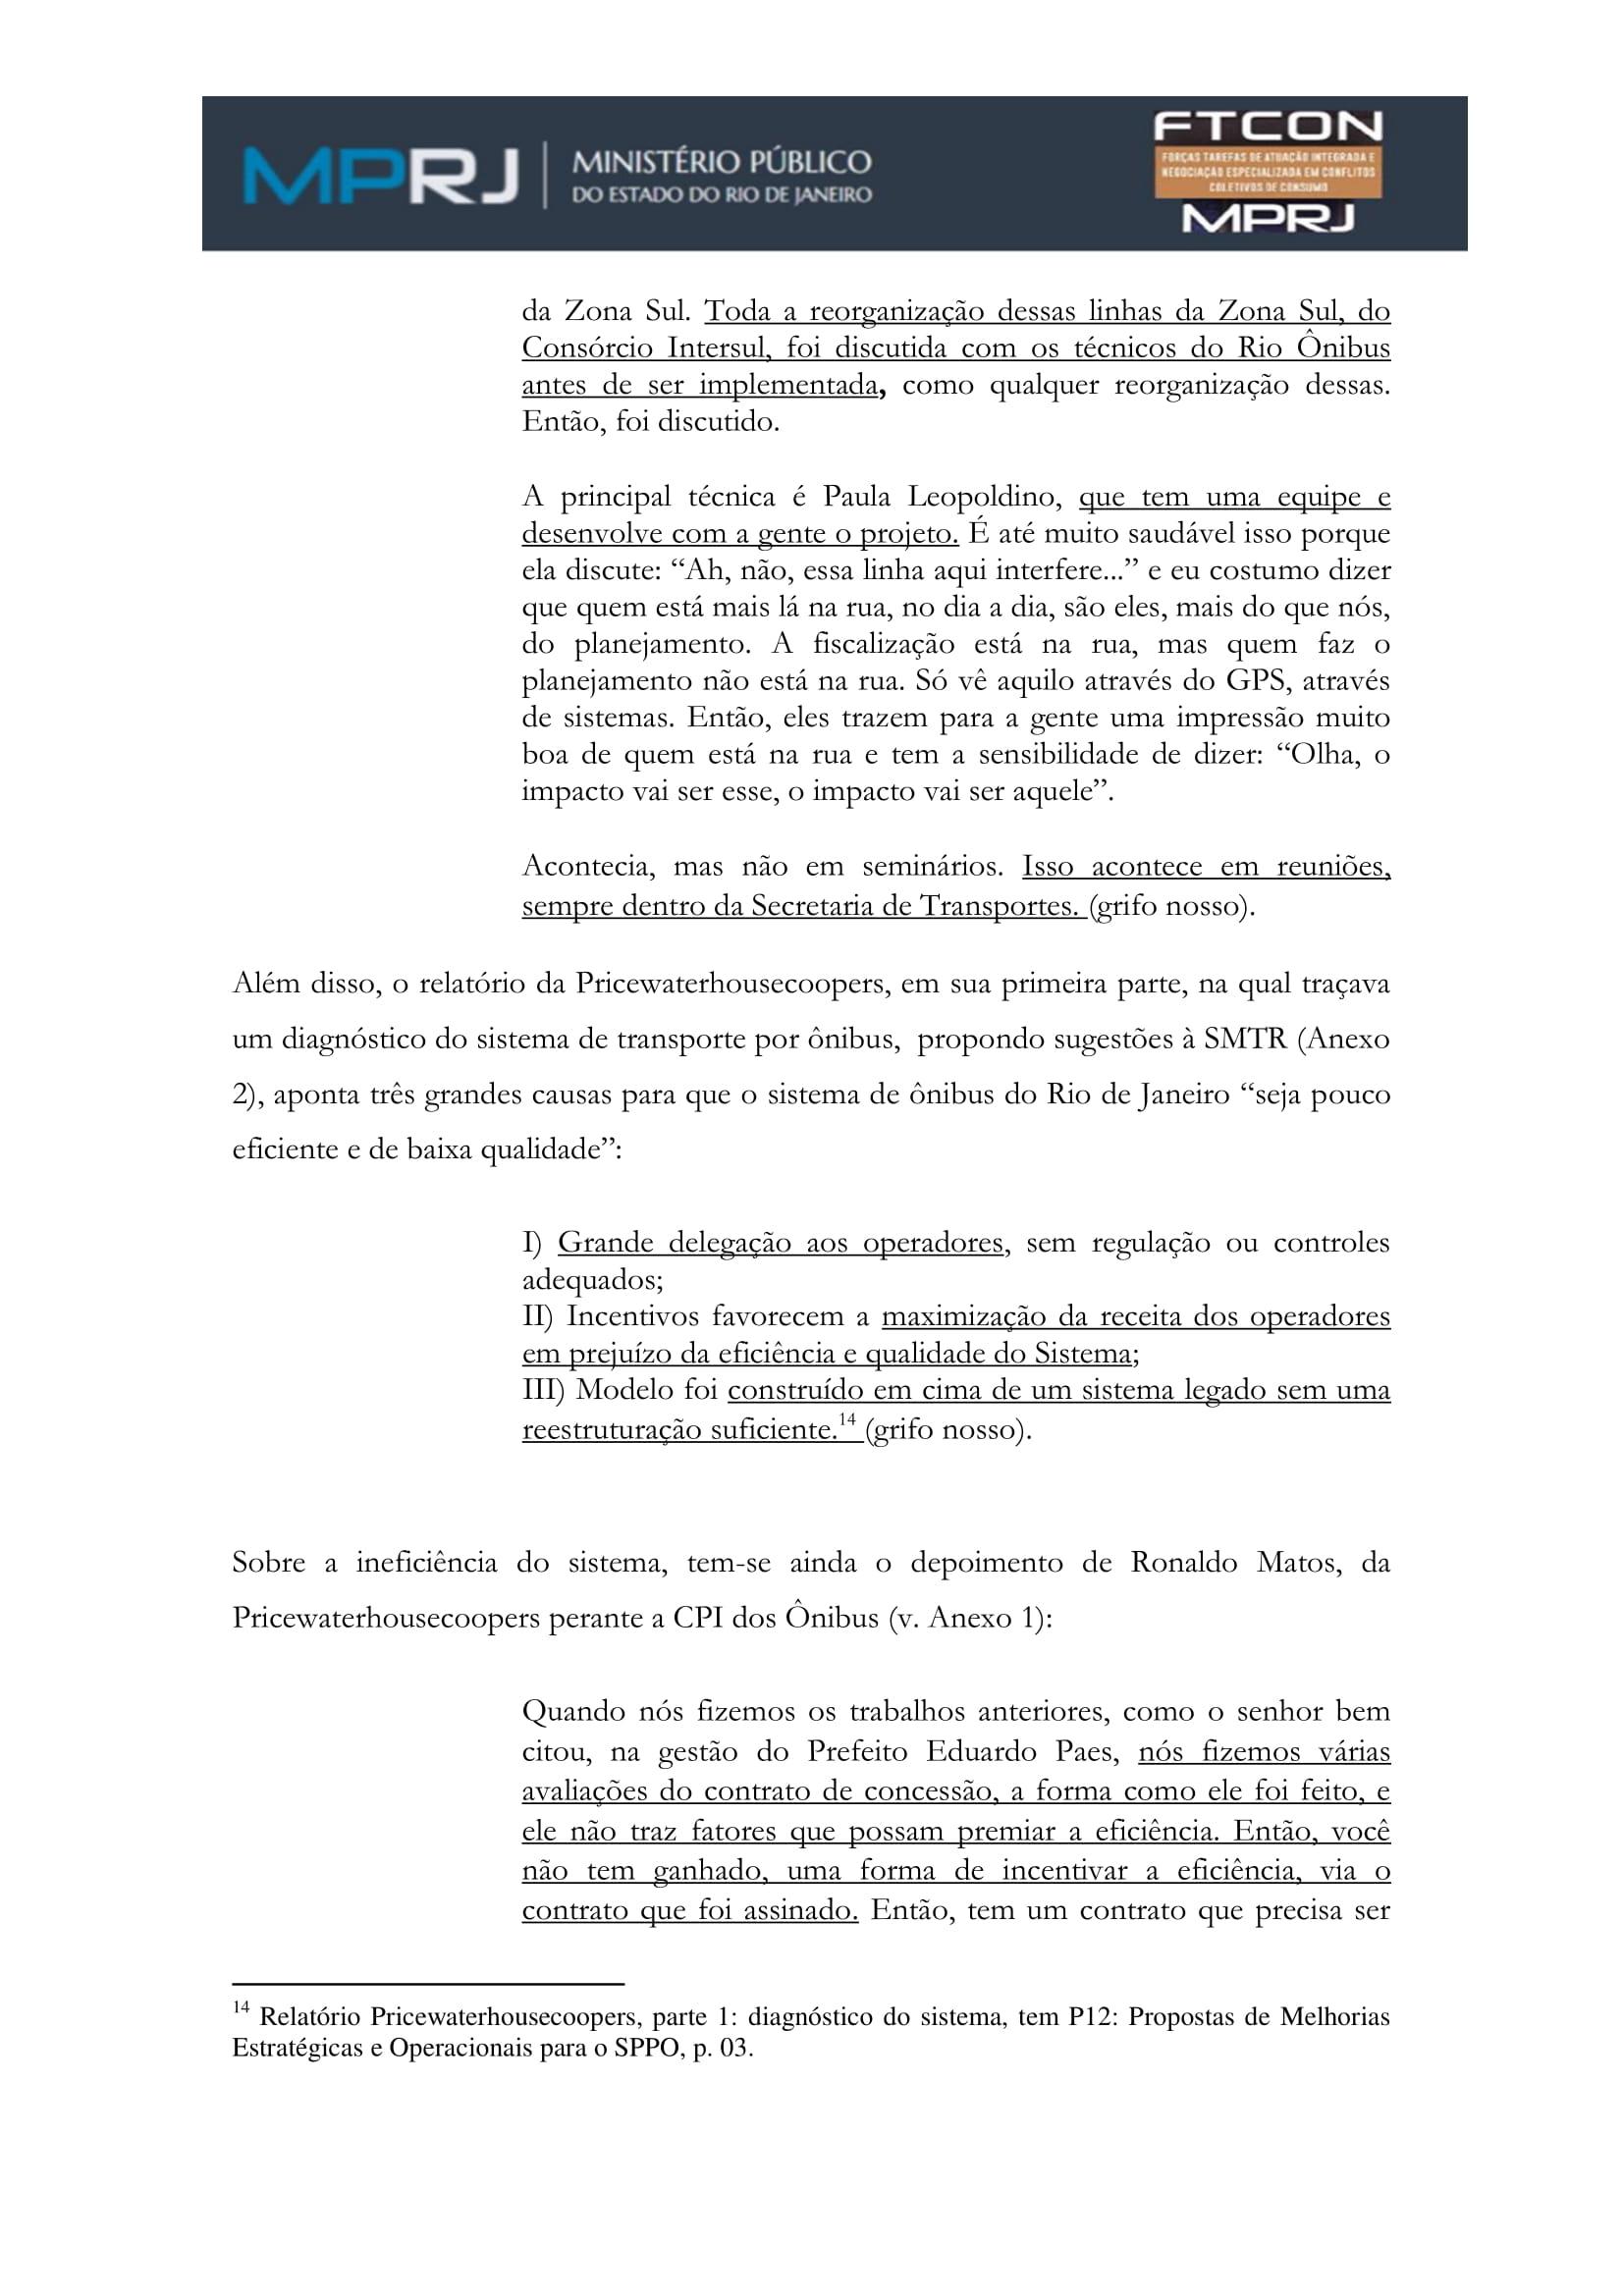 acp_caducidade_onibus_dr_rt-016